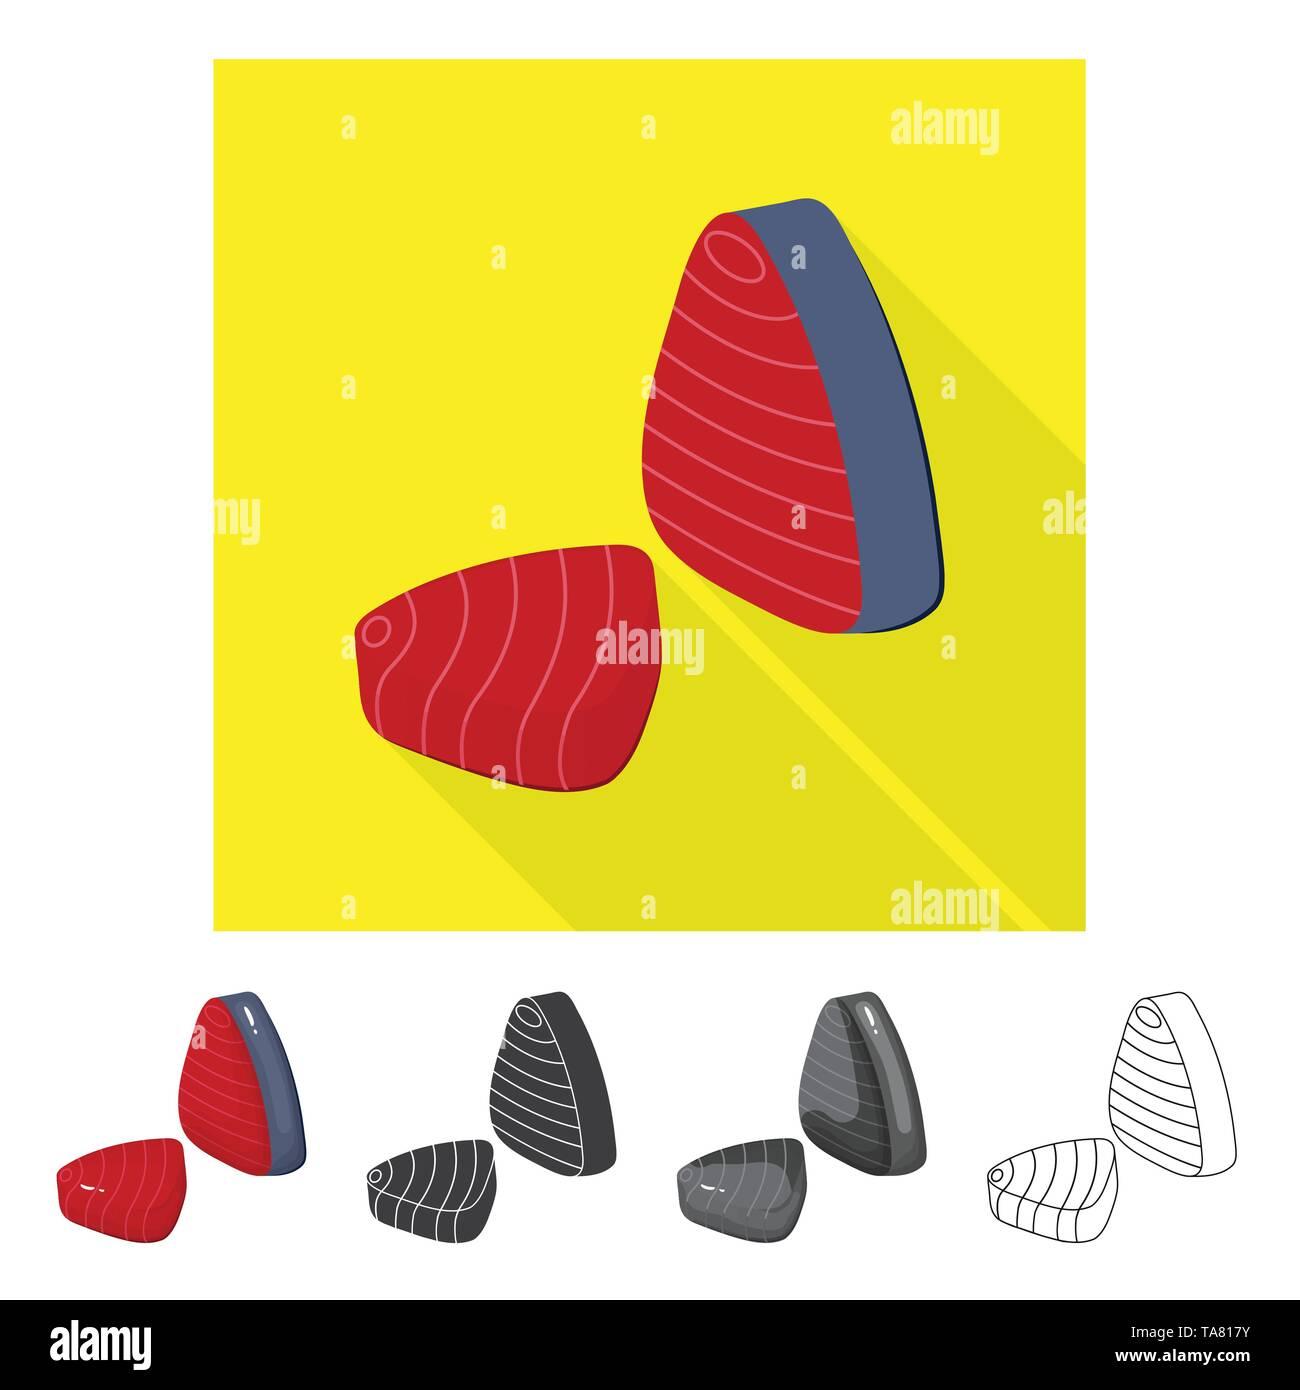 Vector illustration of fresh  and restaurant logo. Set of fresh  and marine   stock vector illustration. - Stock Image